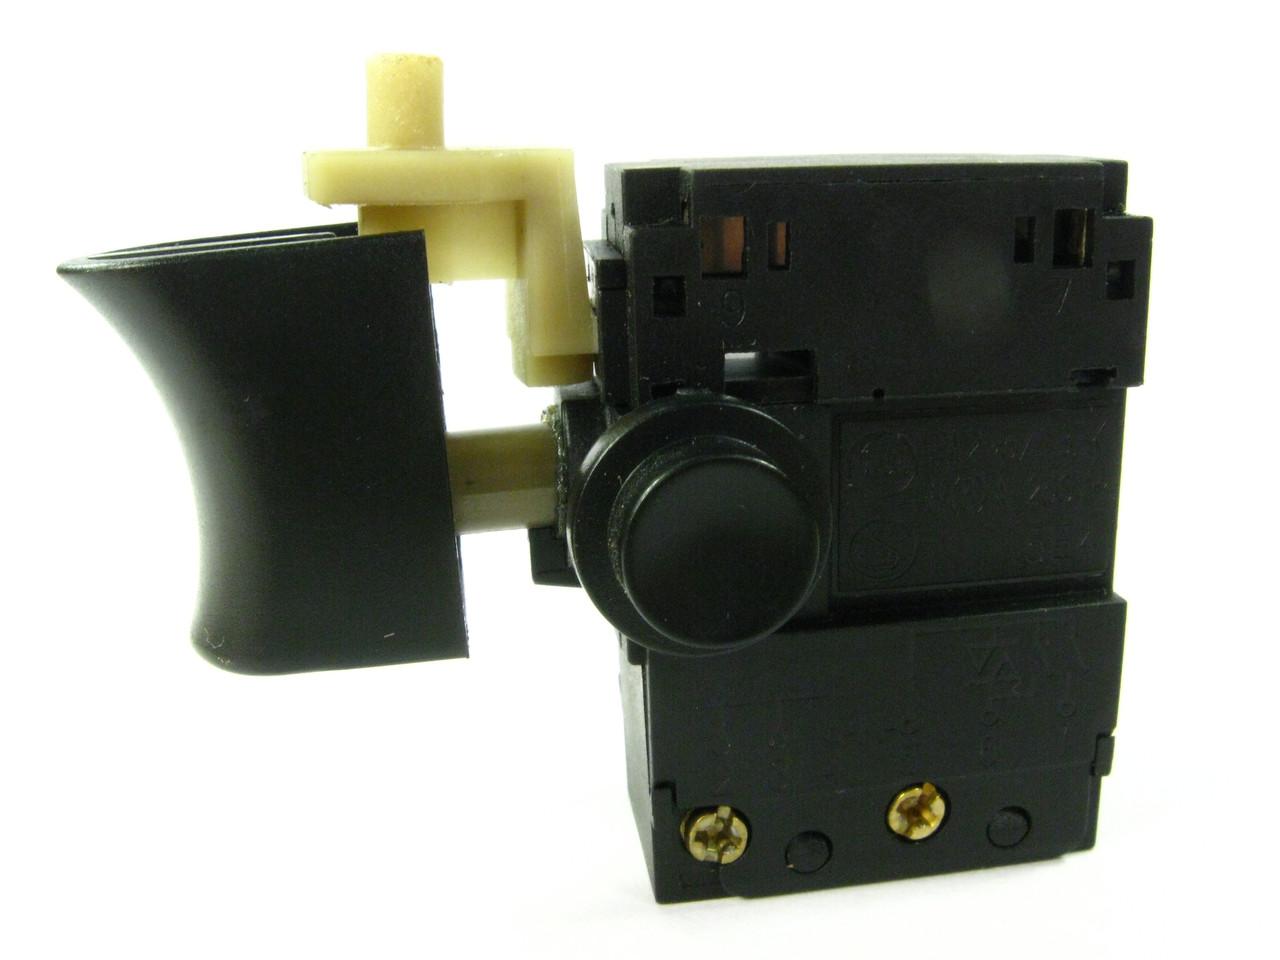 Кнопка сетевого шуруповерта Зенит ЗШ-550 профи